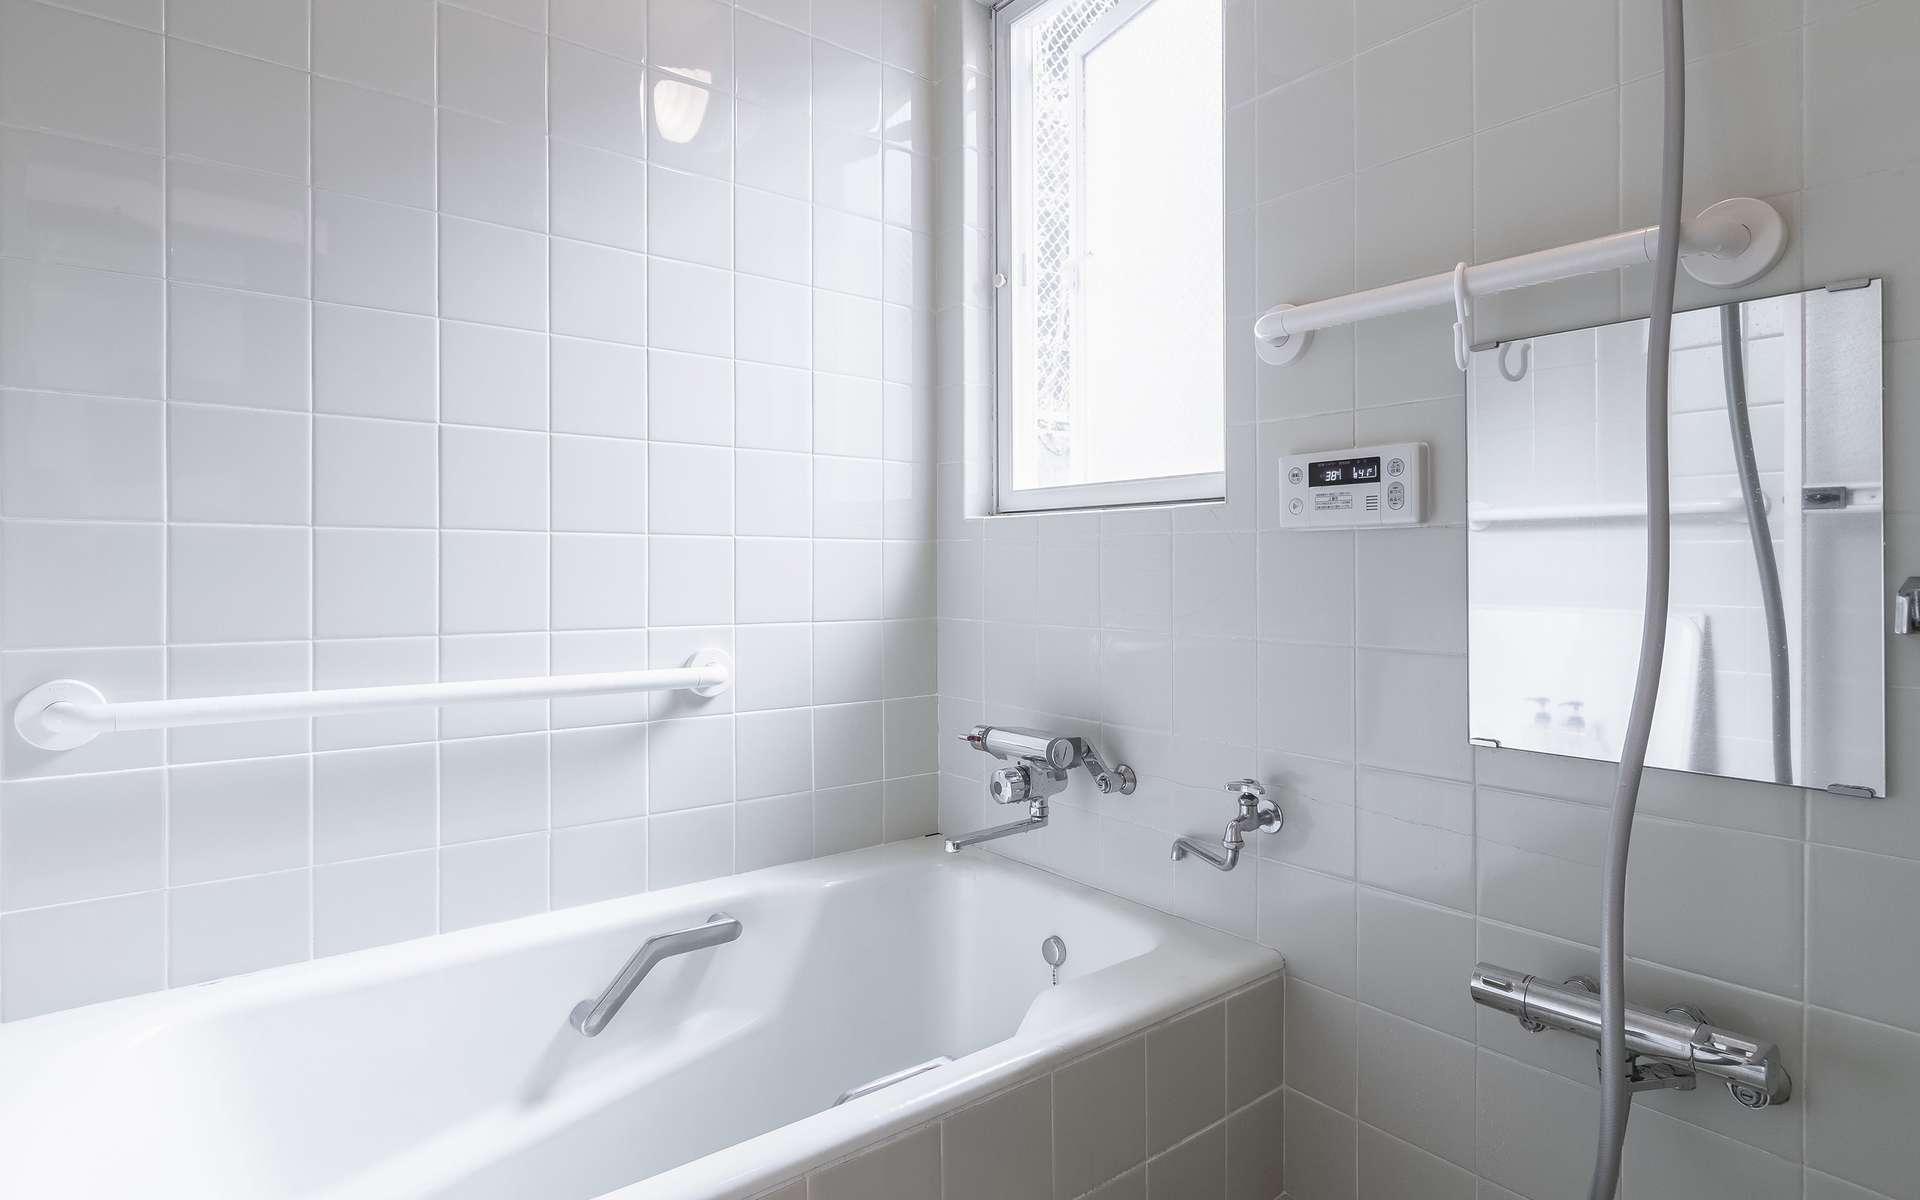 Travaux de peinture pour carrelage de salle de bains. © torsakarin, AdobeStock